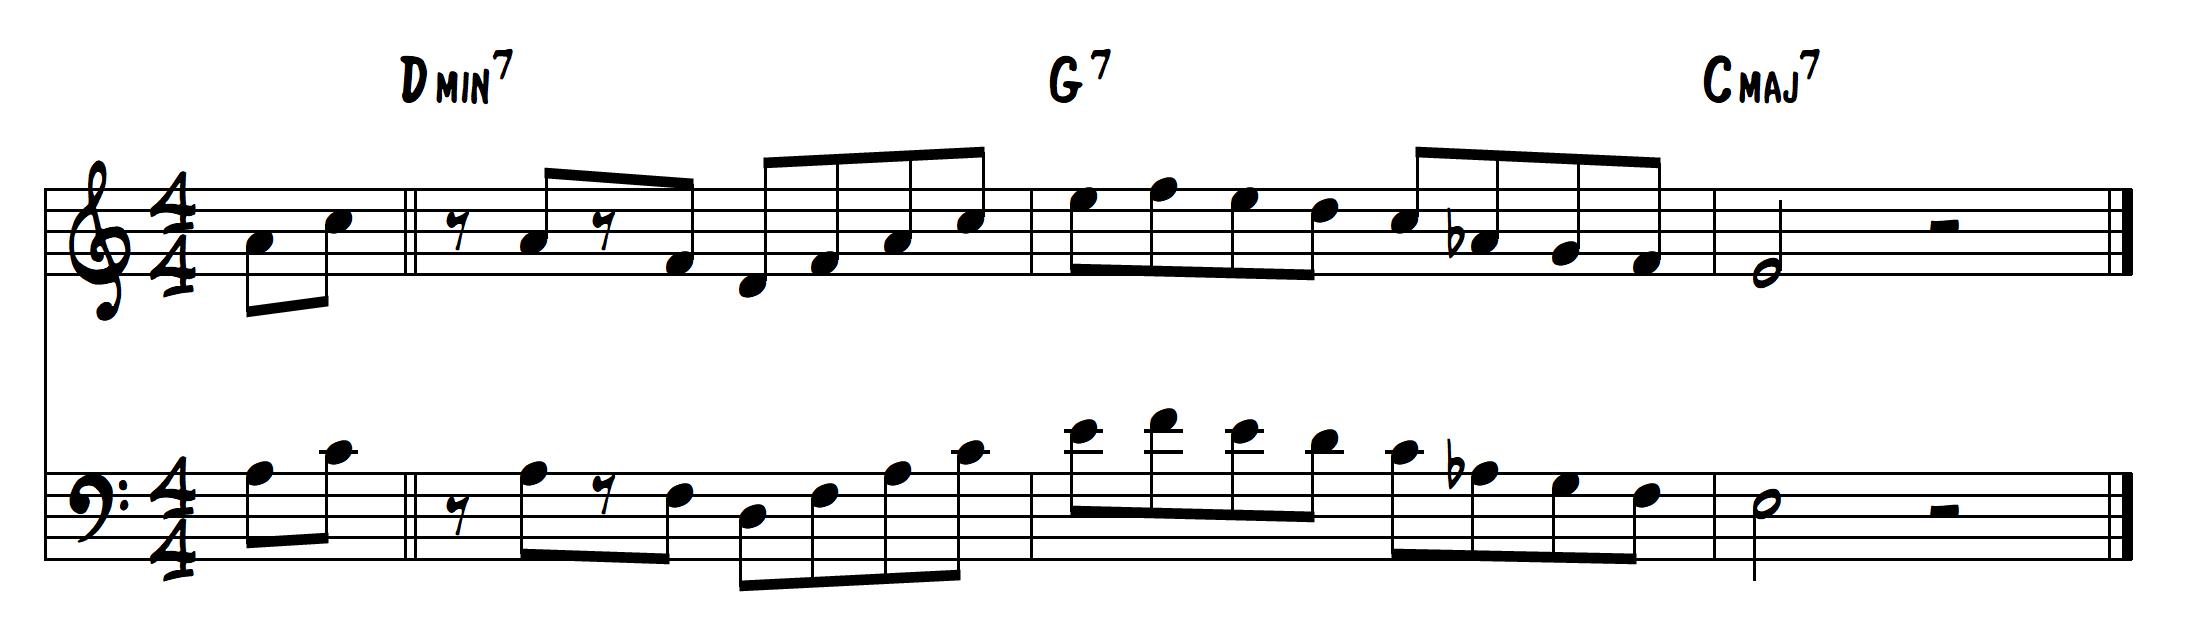 2-5-1 Jazz Improv Lick